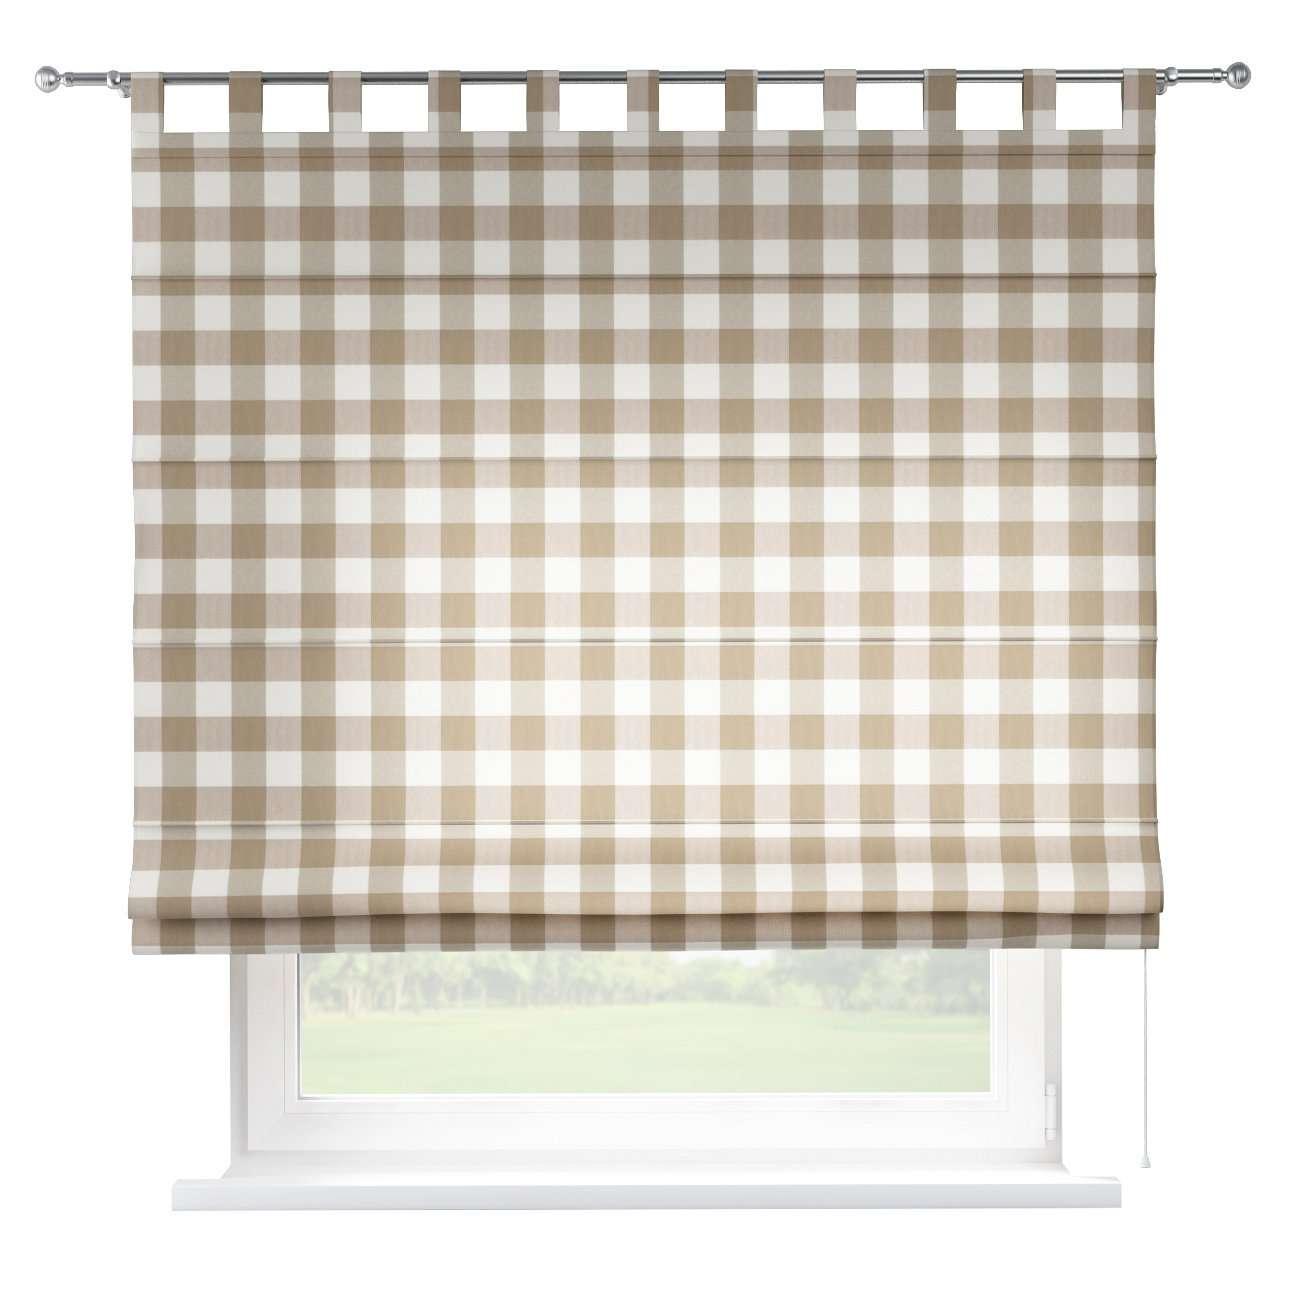 Verona tab top roman blind in collection Quadro, fabric: 136-08